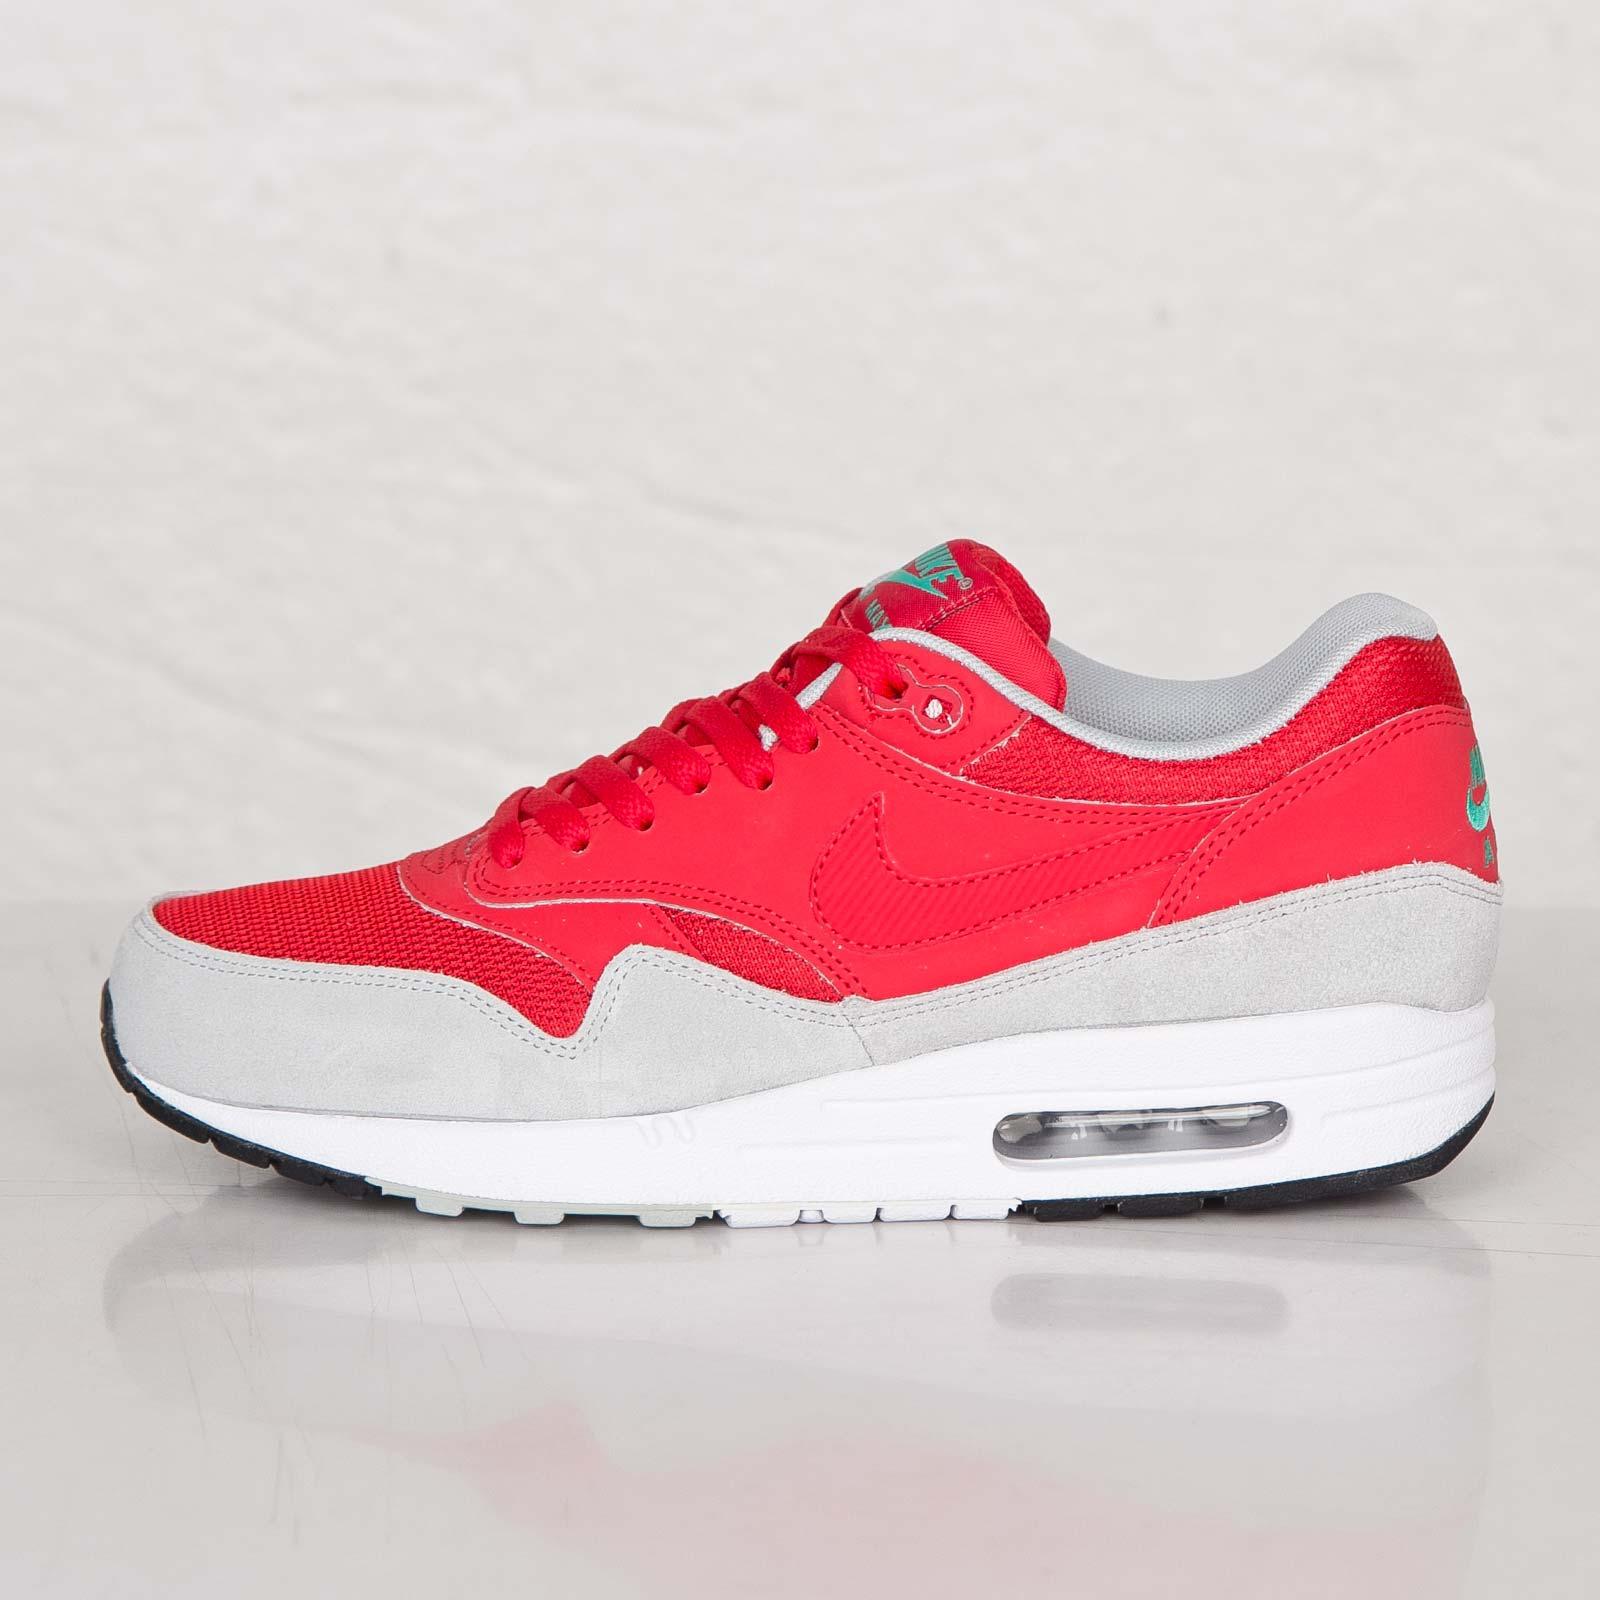 Nike Air Max 1 Essential Daring Red Trainers 537383 600 | eBay